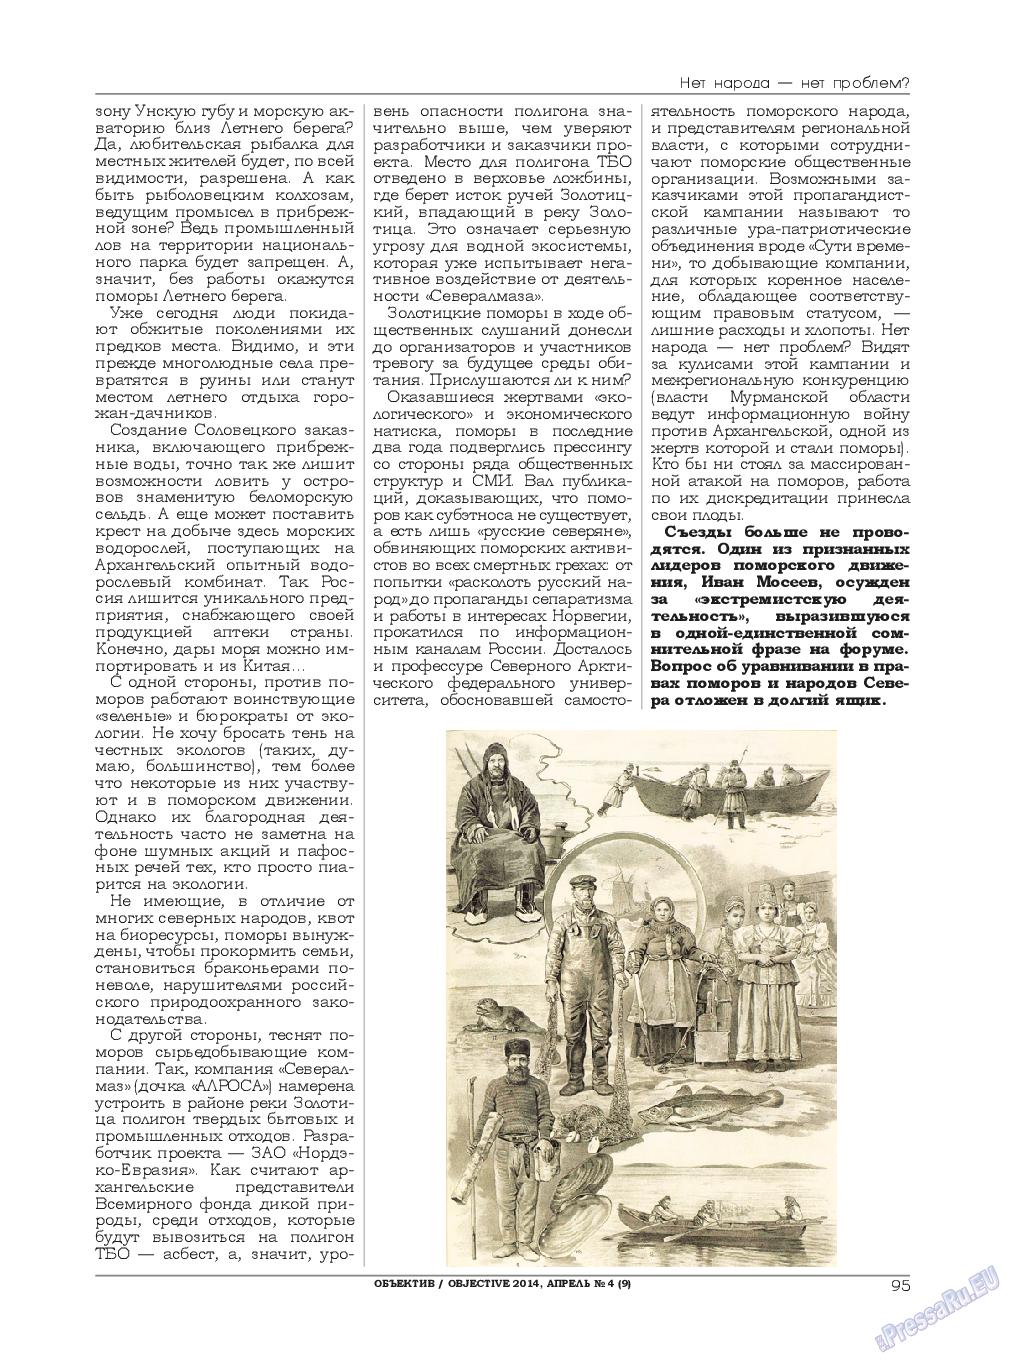 Объектив EU (журнал). 2014 год, номер 4, стр. 95